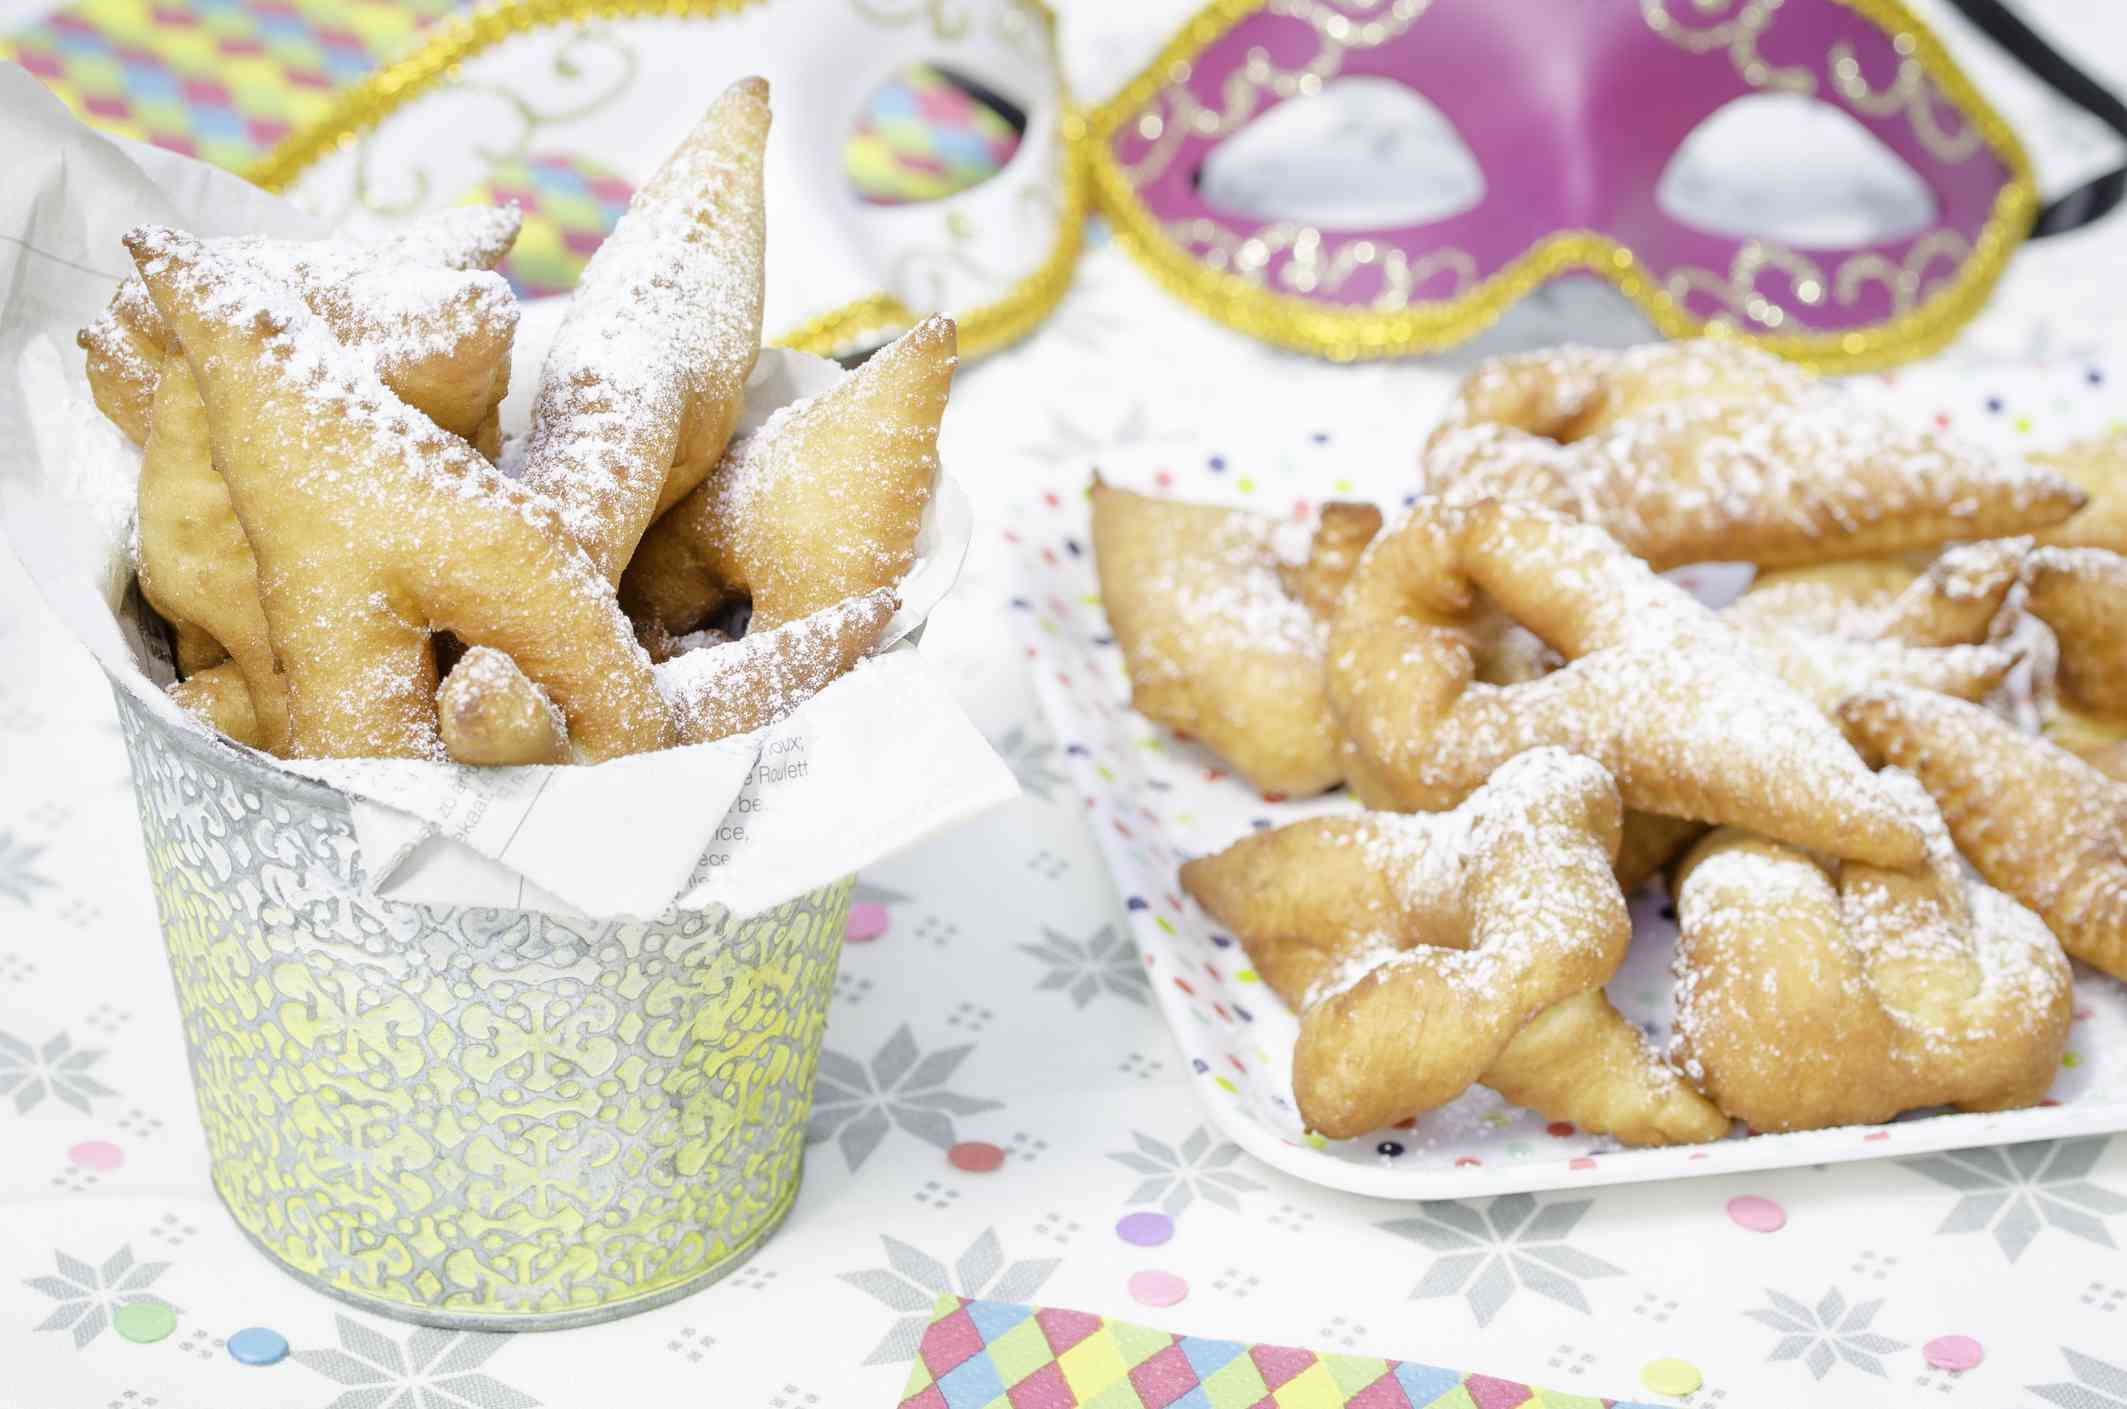 Bugnes, doughnuts served in Lyon for Mardi Gras